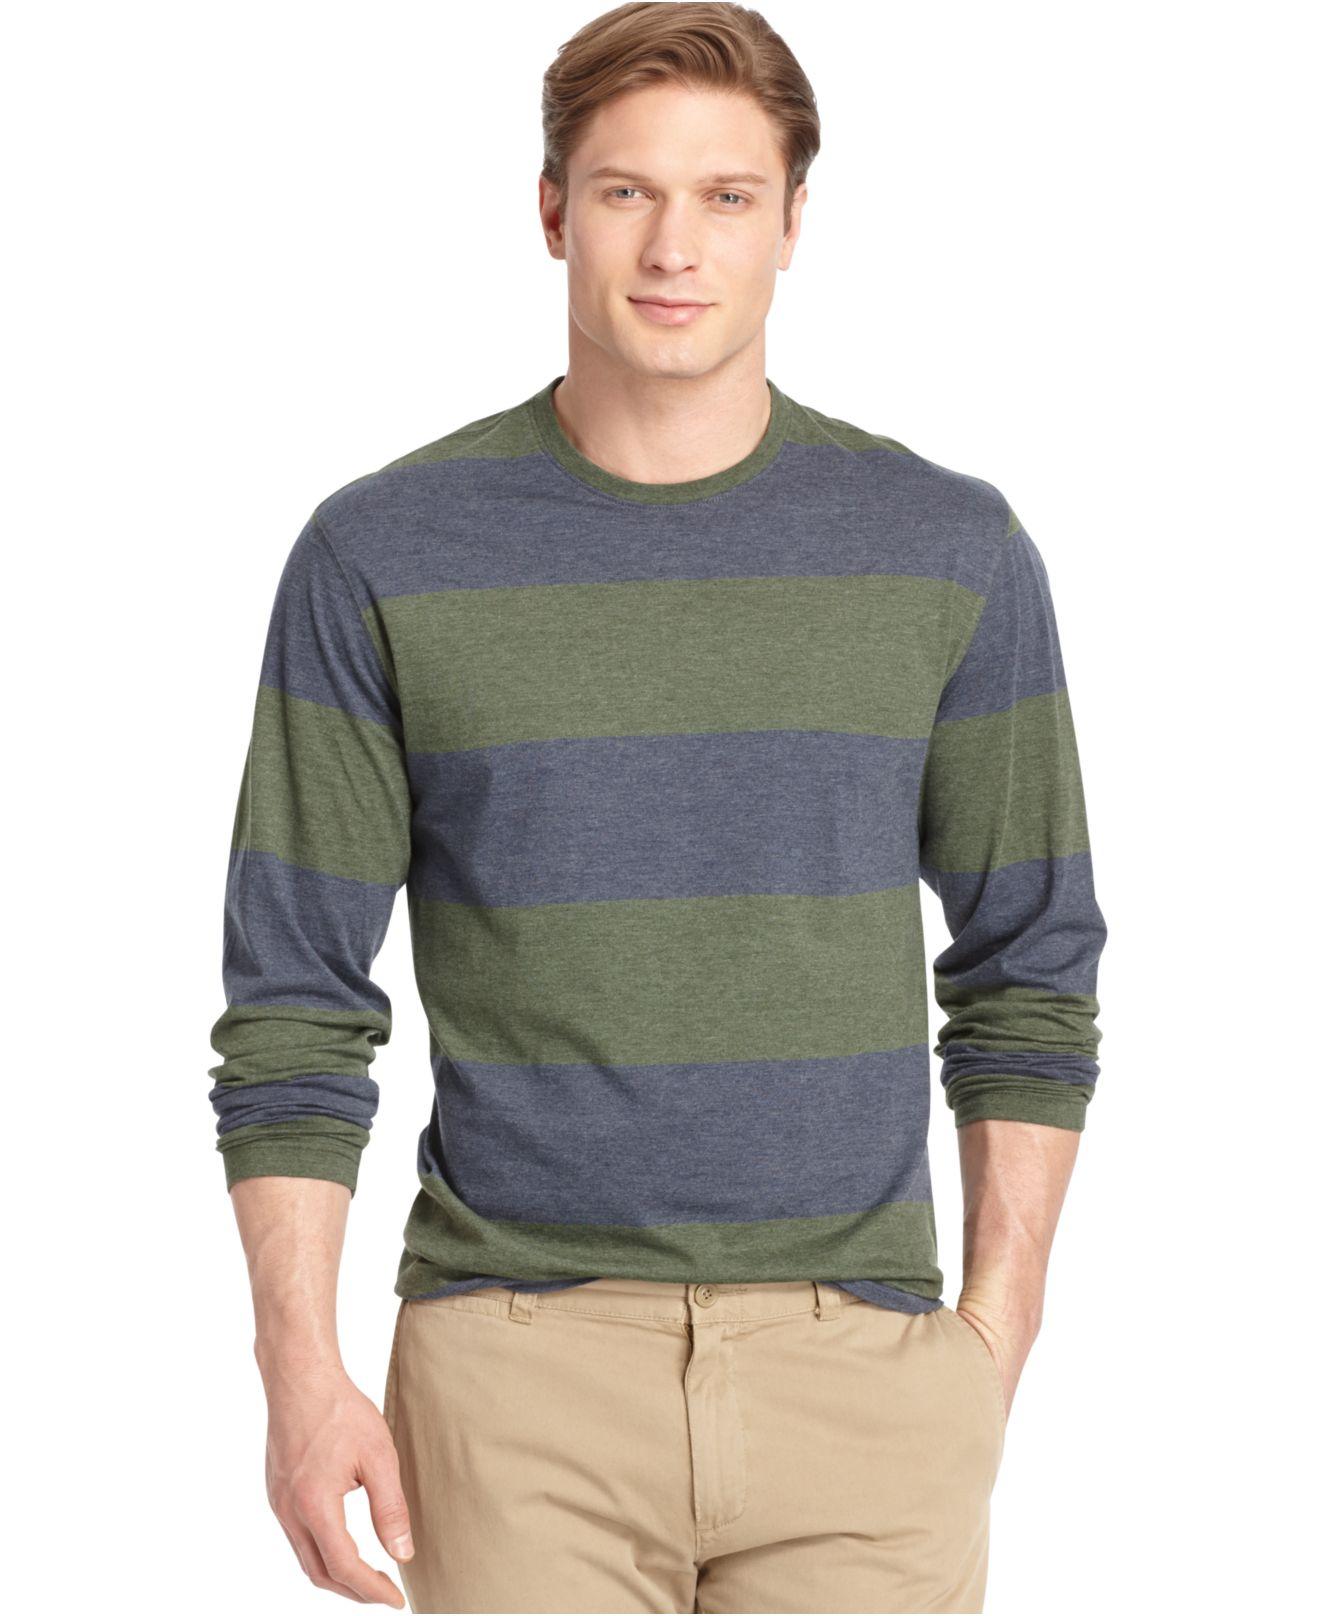 Izod Long-sleeve Striped T-shirt in Green for Men